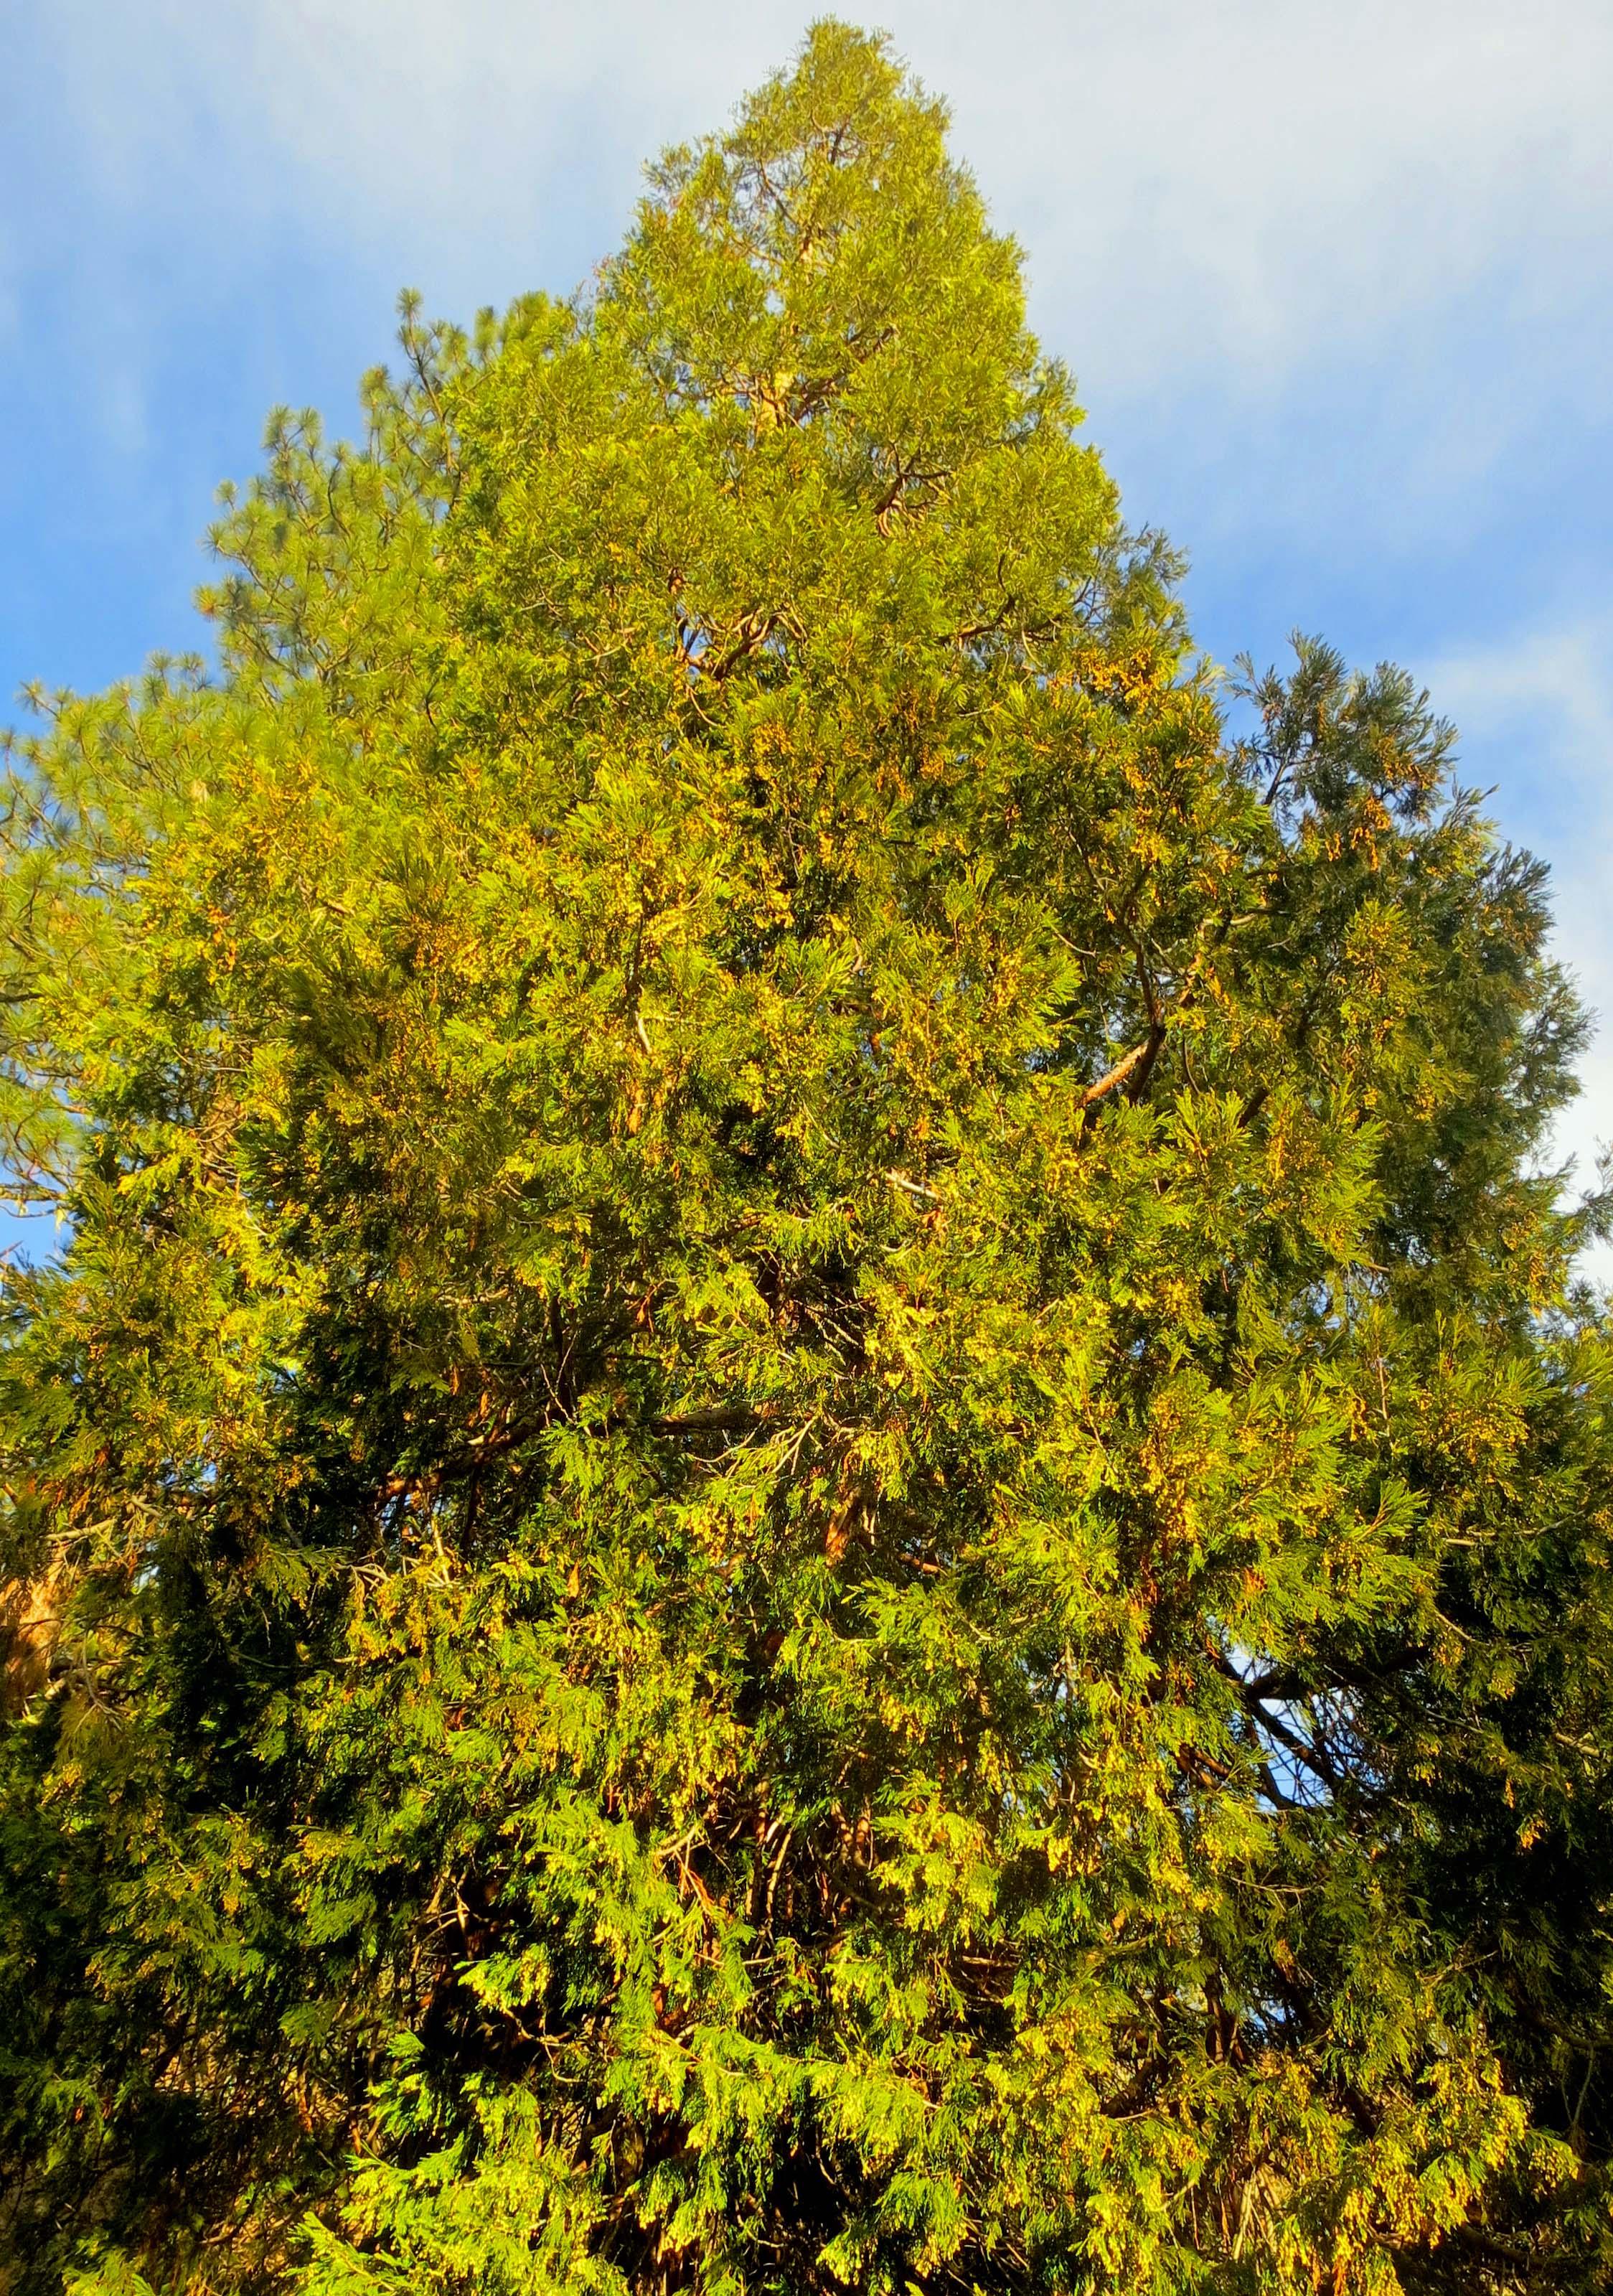 Oregon Red Cedar. Photo by Curtis Mekemson.